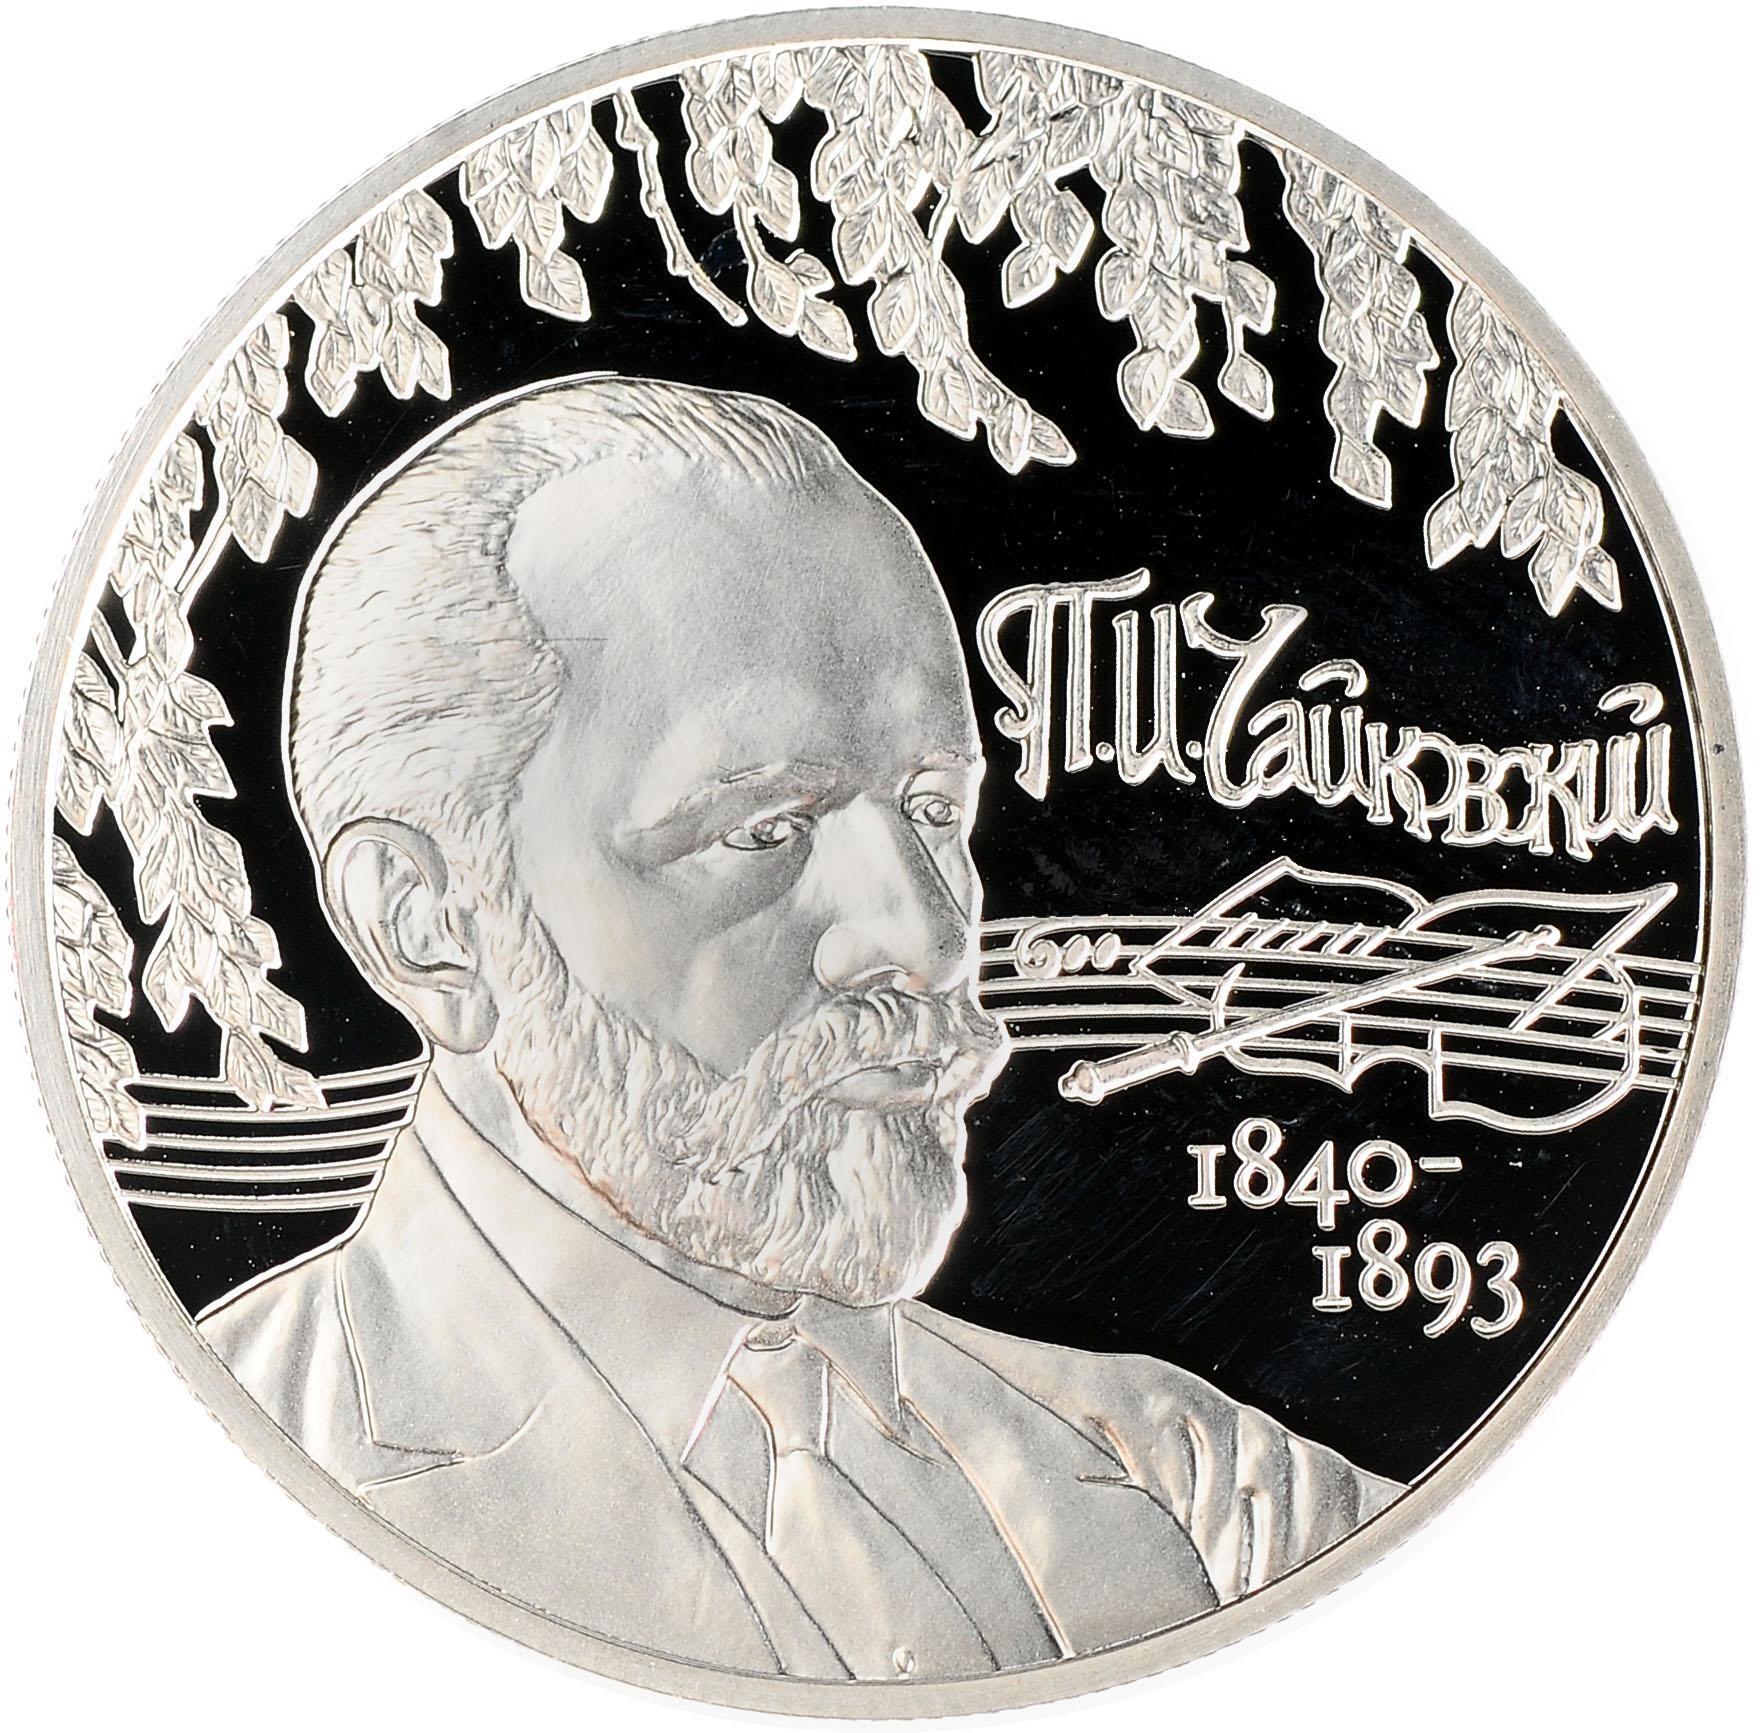 Монета 2 рубля 2015 ММД Композитор П.И. Чайковский